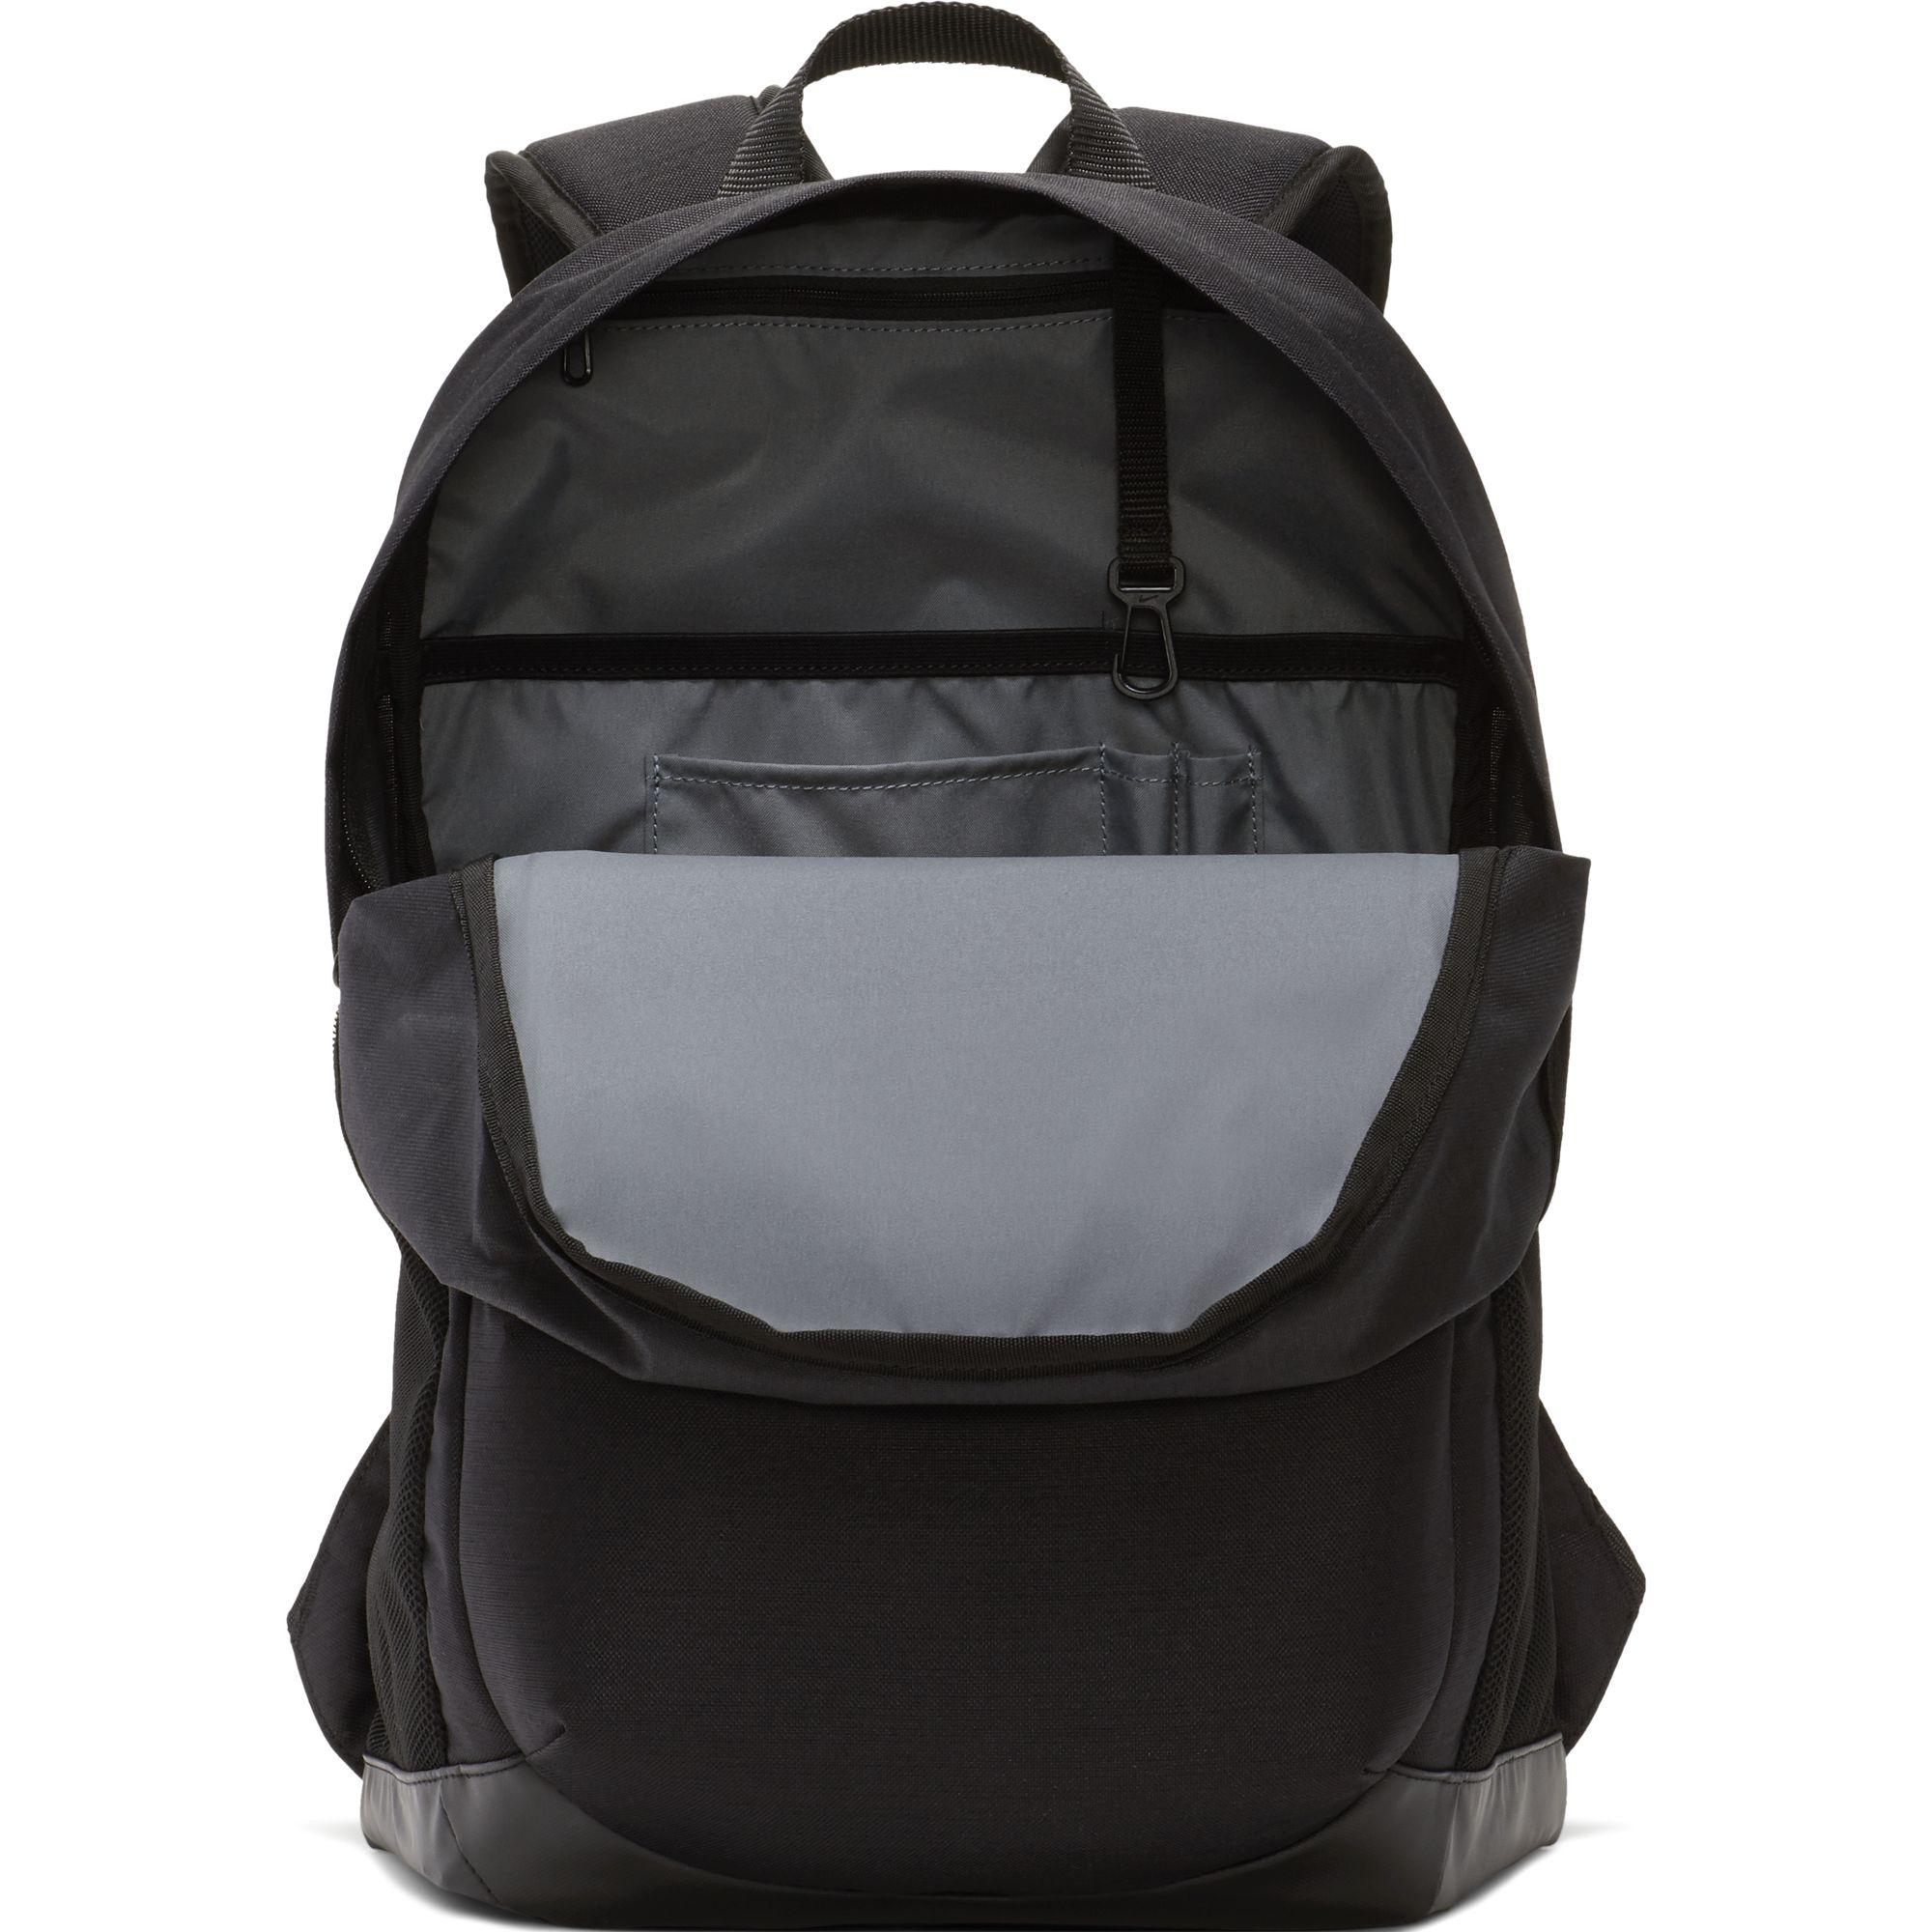 18cae073ca845 ... plecak Nike Brasilia (Medium) Training Backpack BA5329 010 ...